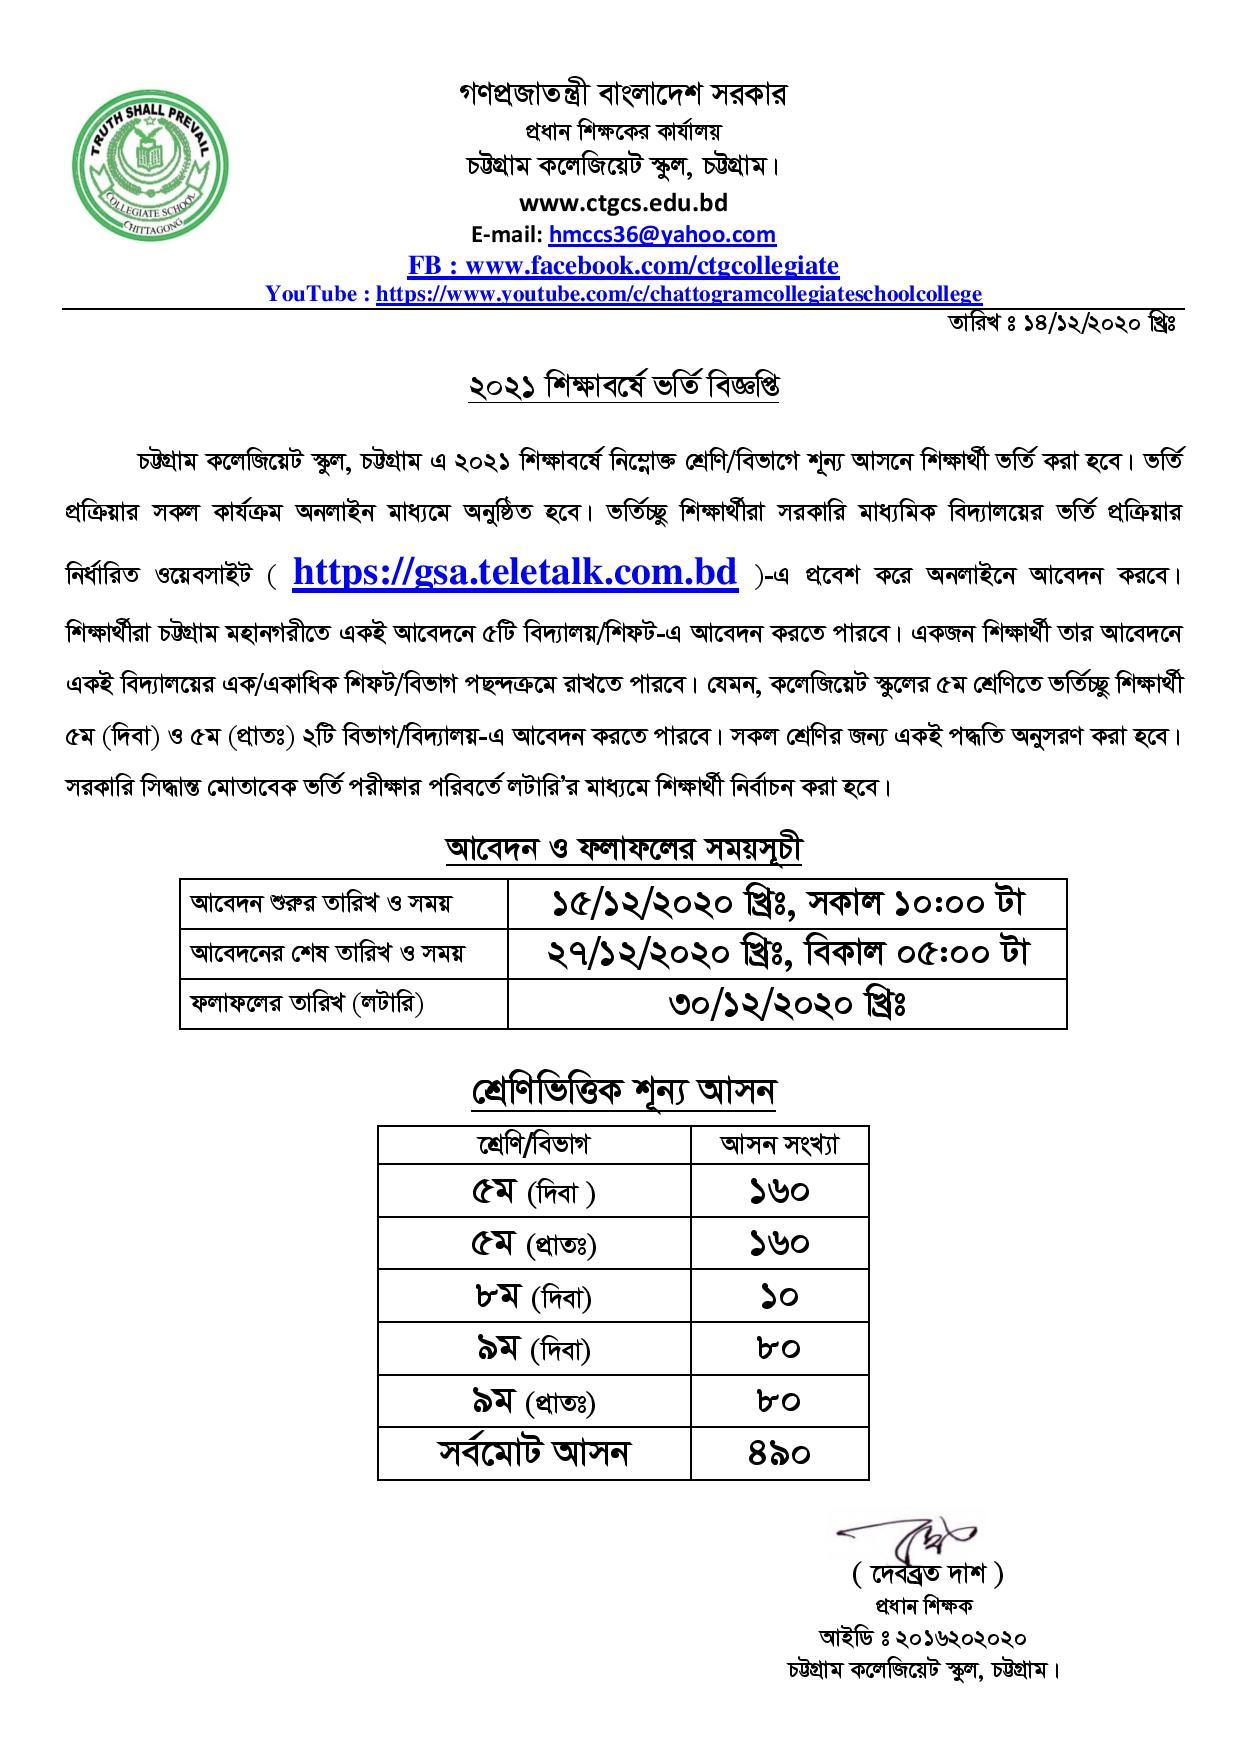 Collegiate-Admission-Circular-2021-pdf-5fd741a1295bb-page-001